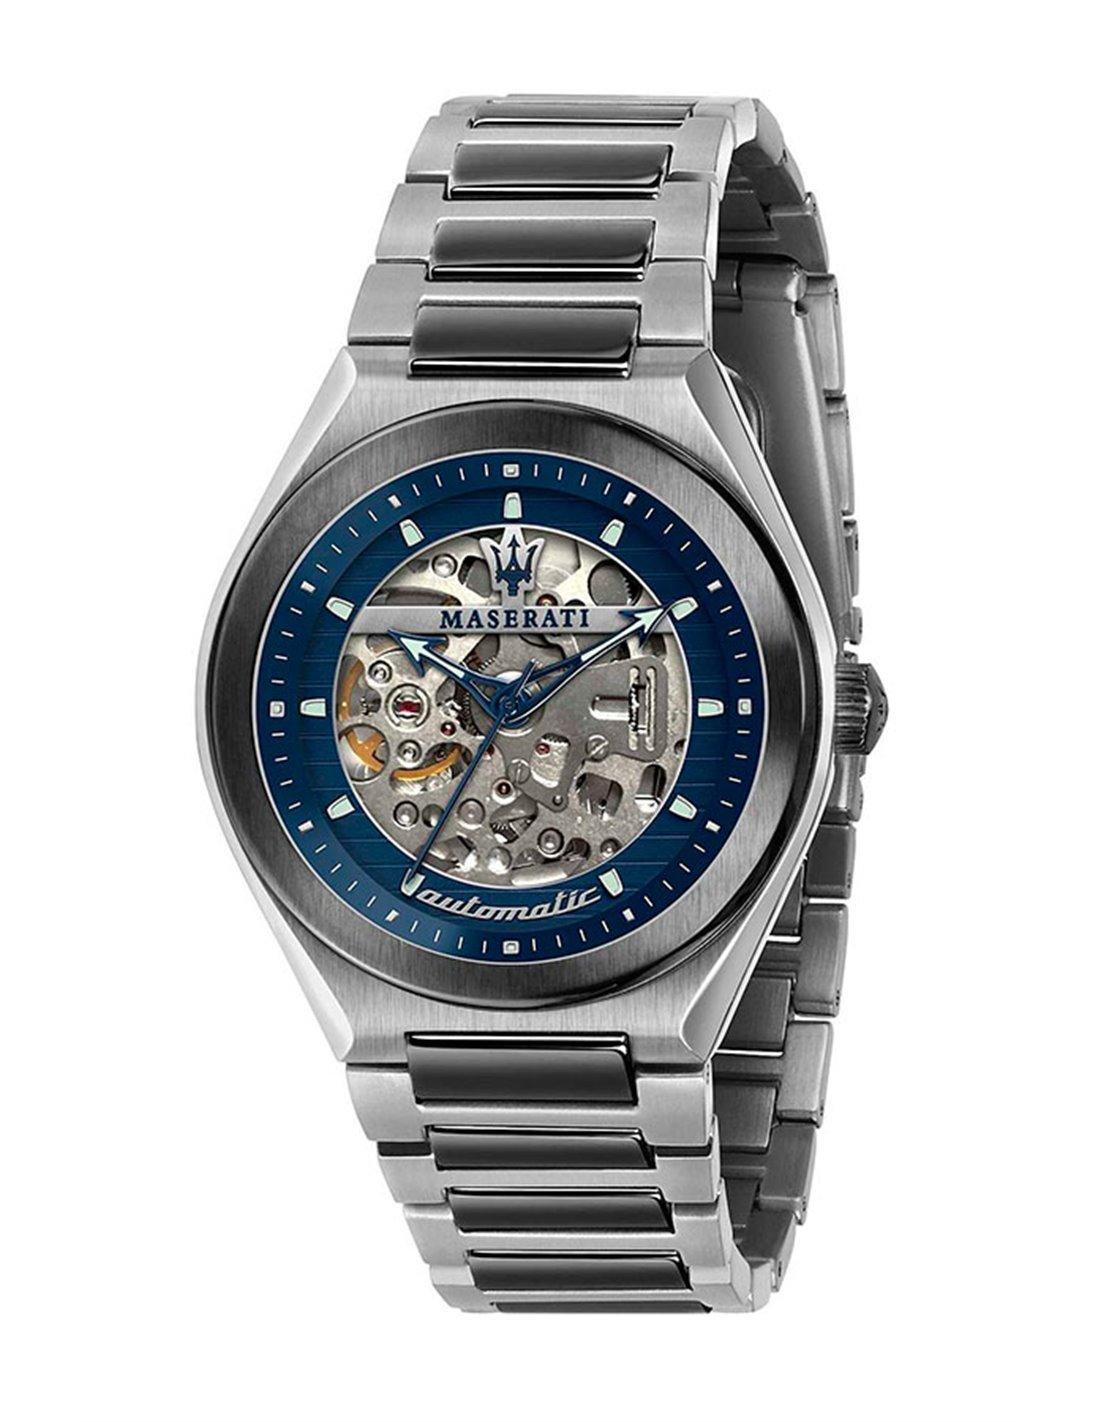 Maserati Watch R8851108015 Potenza Date Window Luminescent-Blue / Stainless Steel